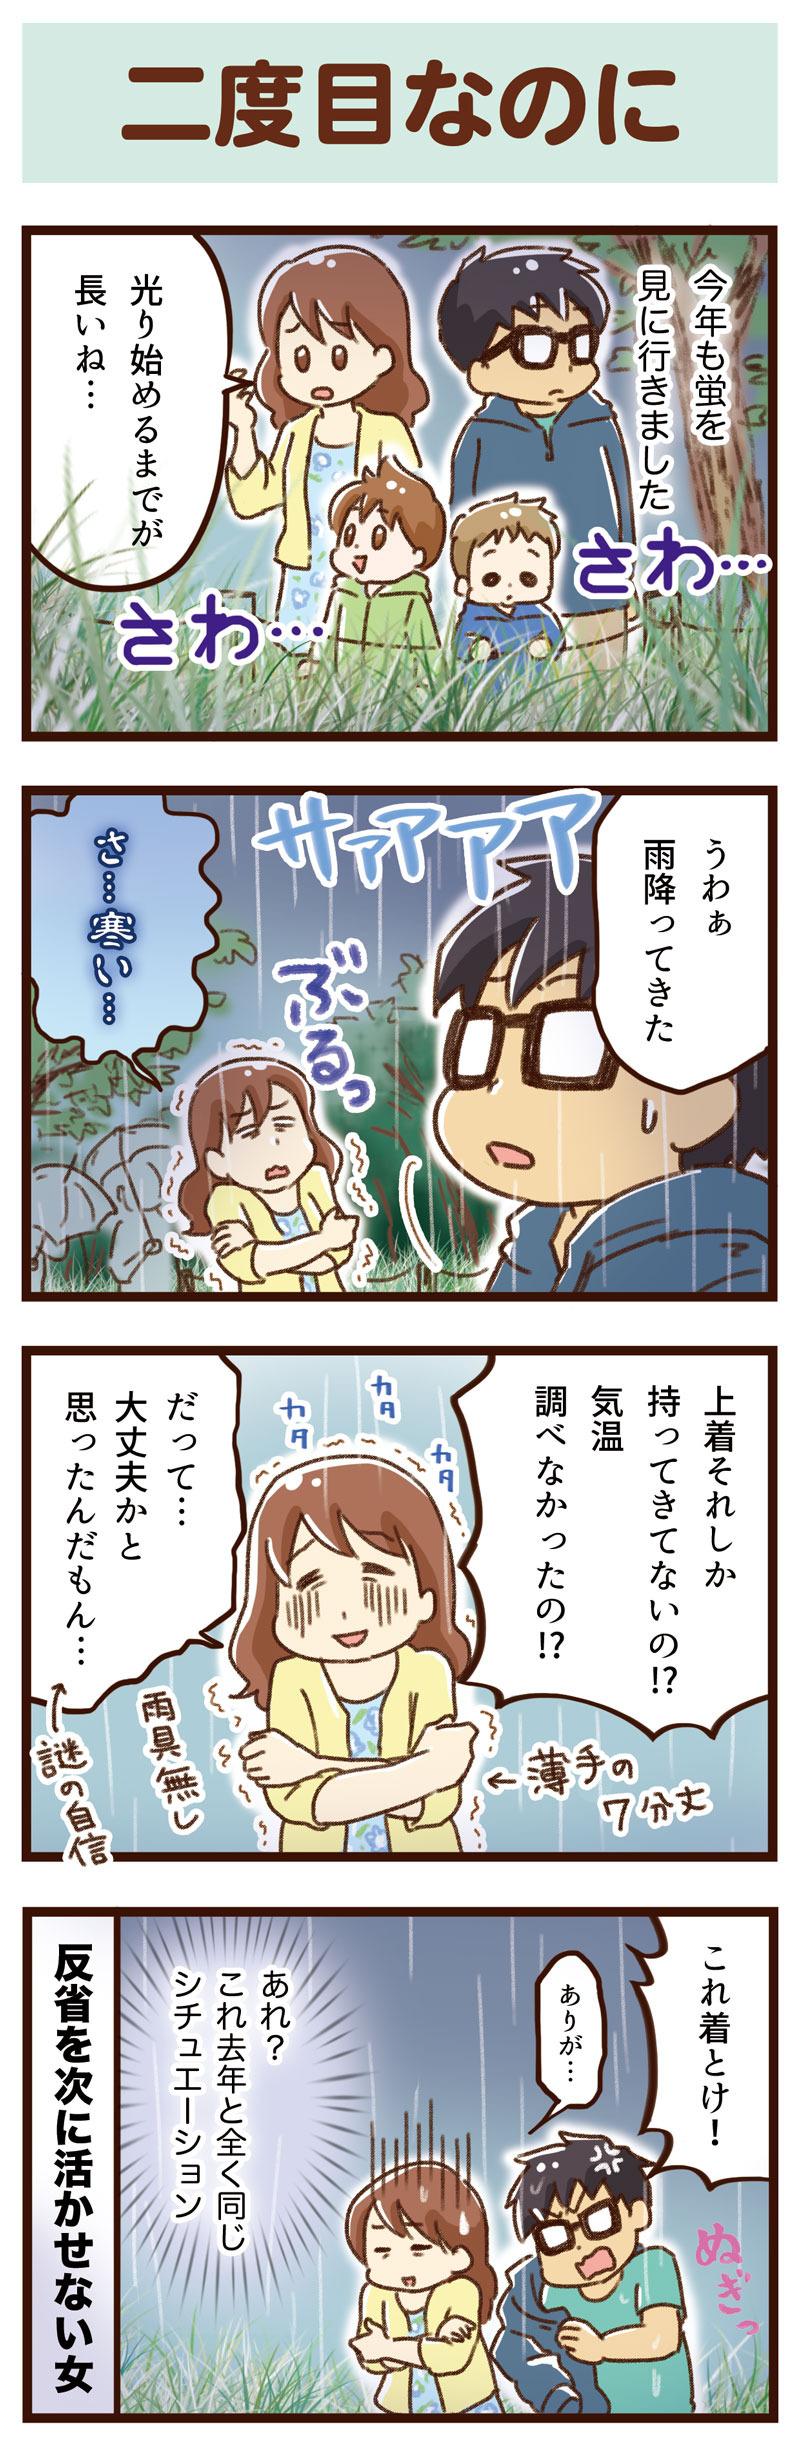 yumui306-1